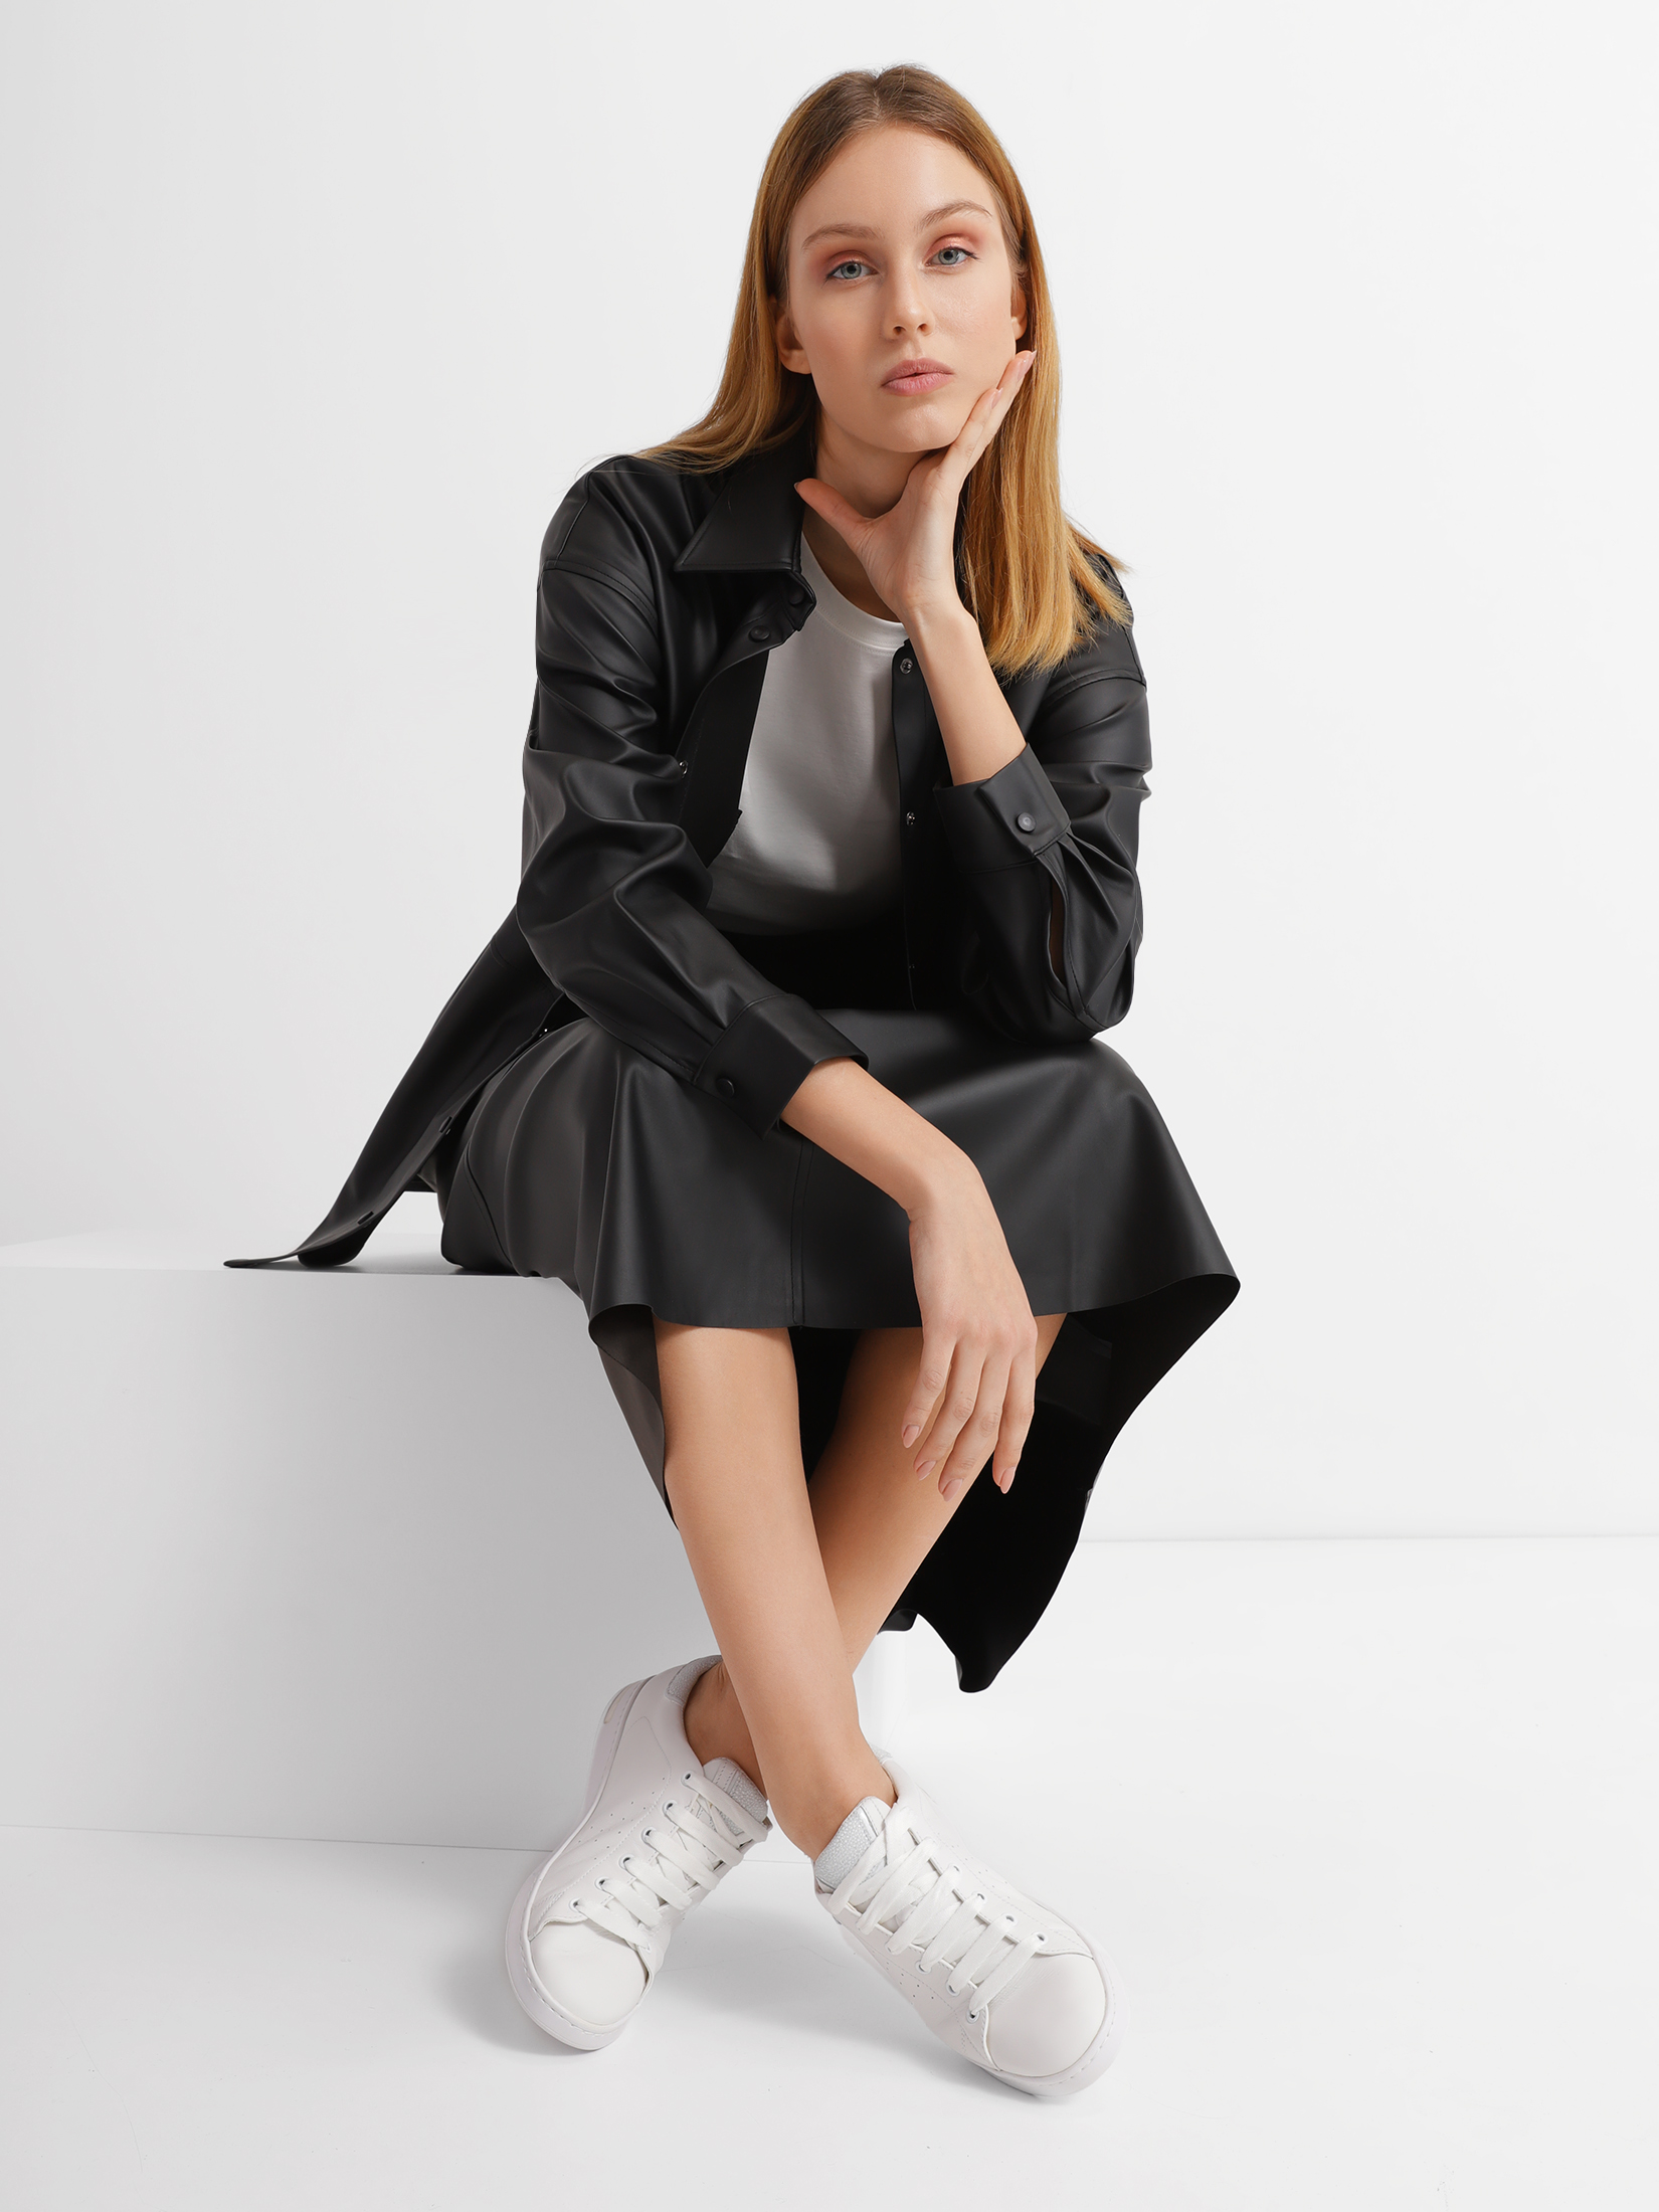 Кроссовки для женщин Geox D JAYSEN A - NAPPA XW3052 купить, 2017